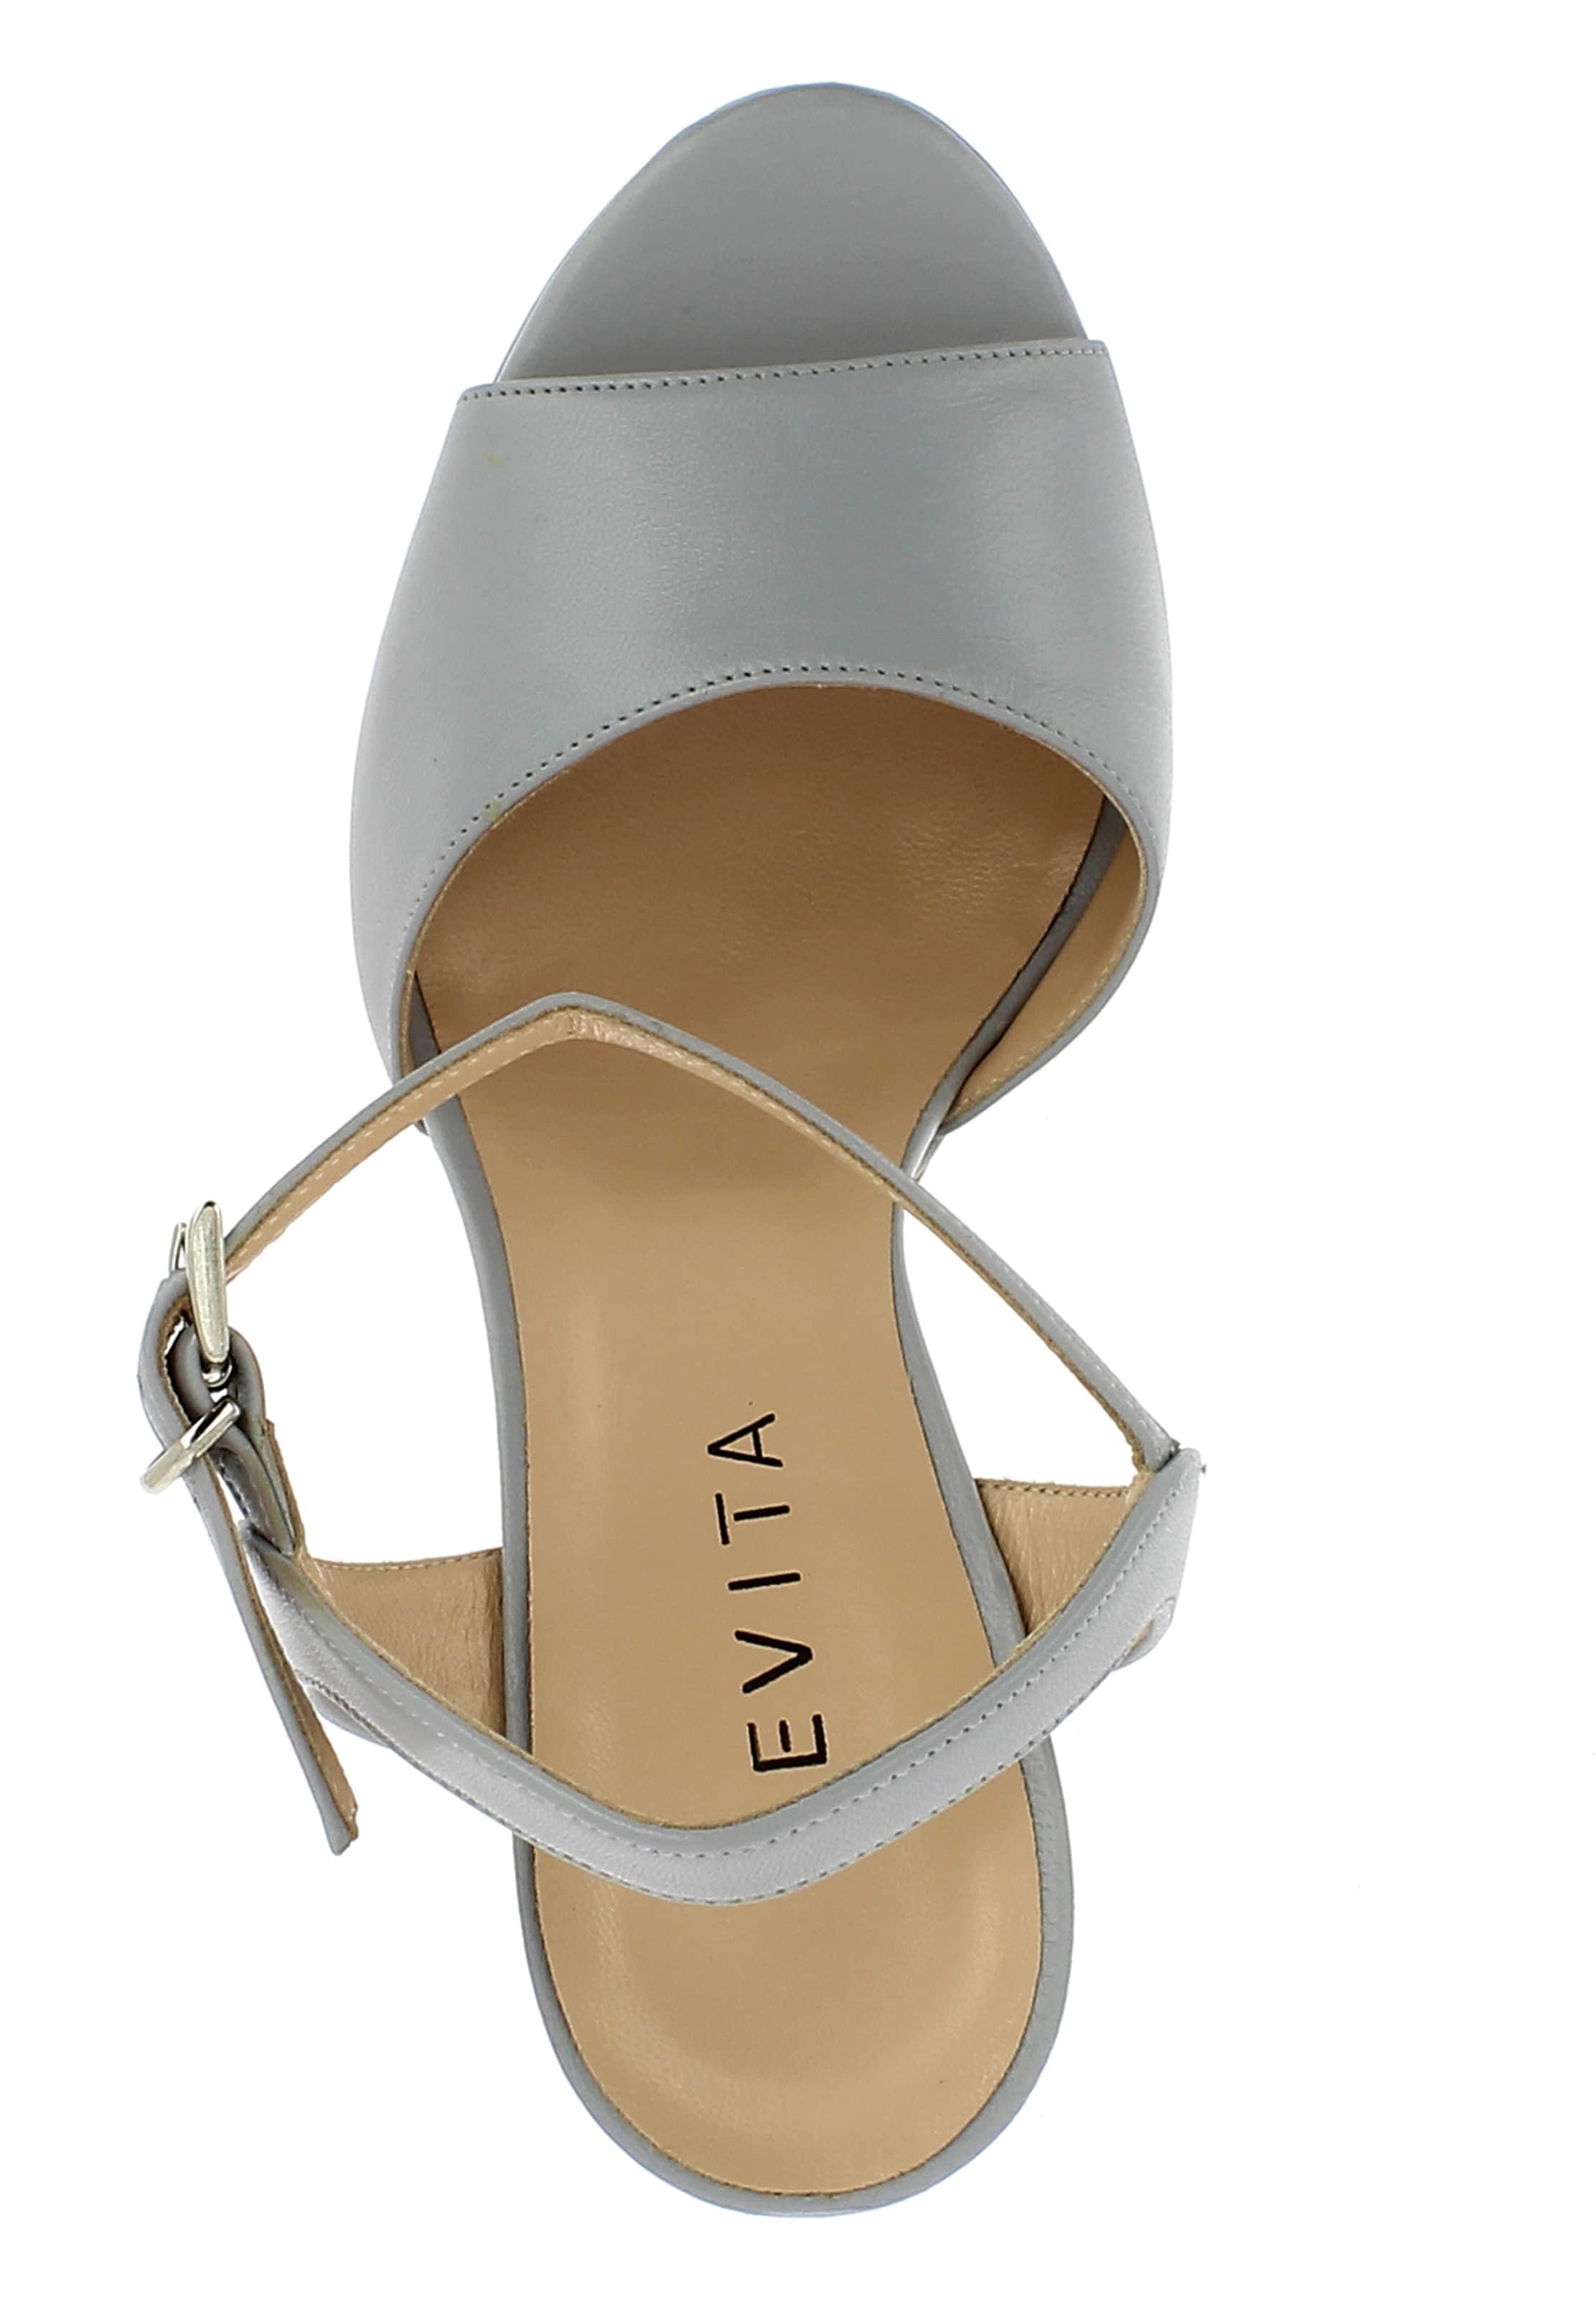 Sandalette Hellgrau In Hellgrau Evita Evita In Damen Damen Evita Damen Sandalette q3RAj54SLc